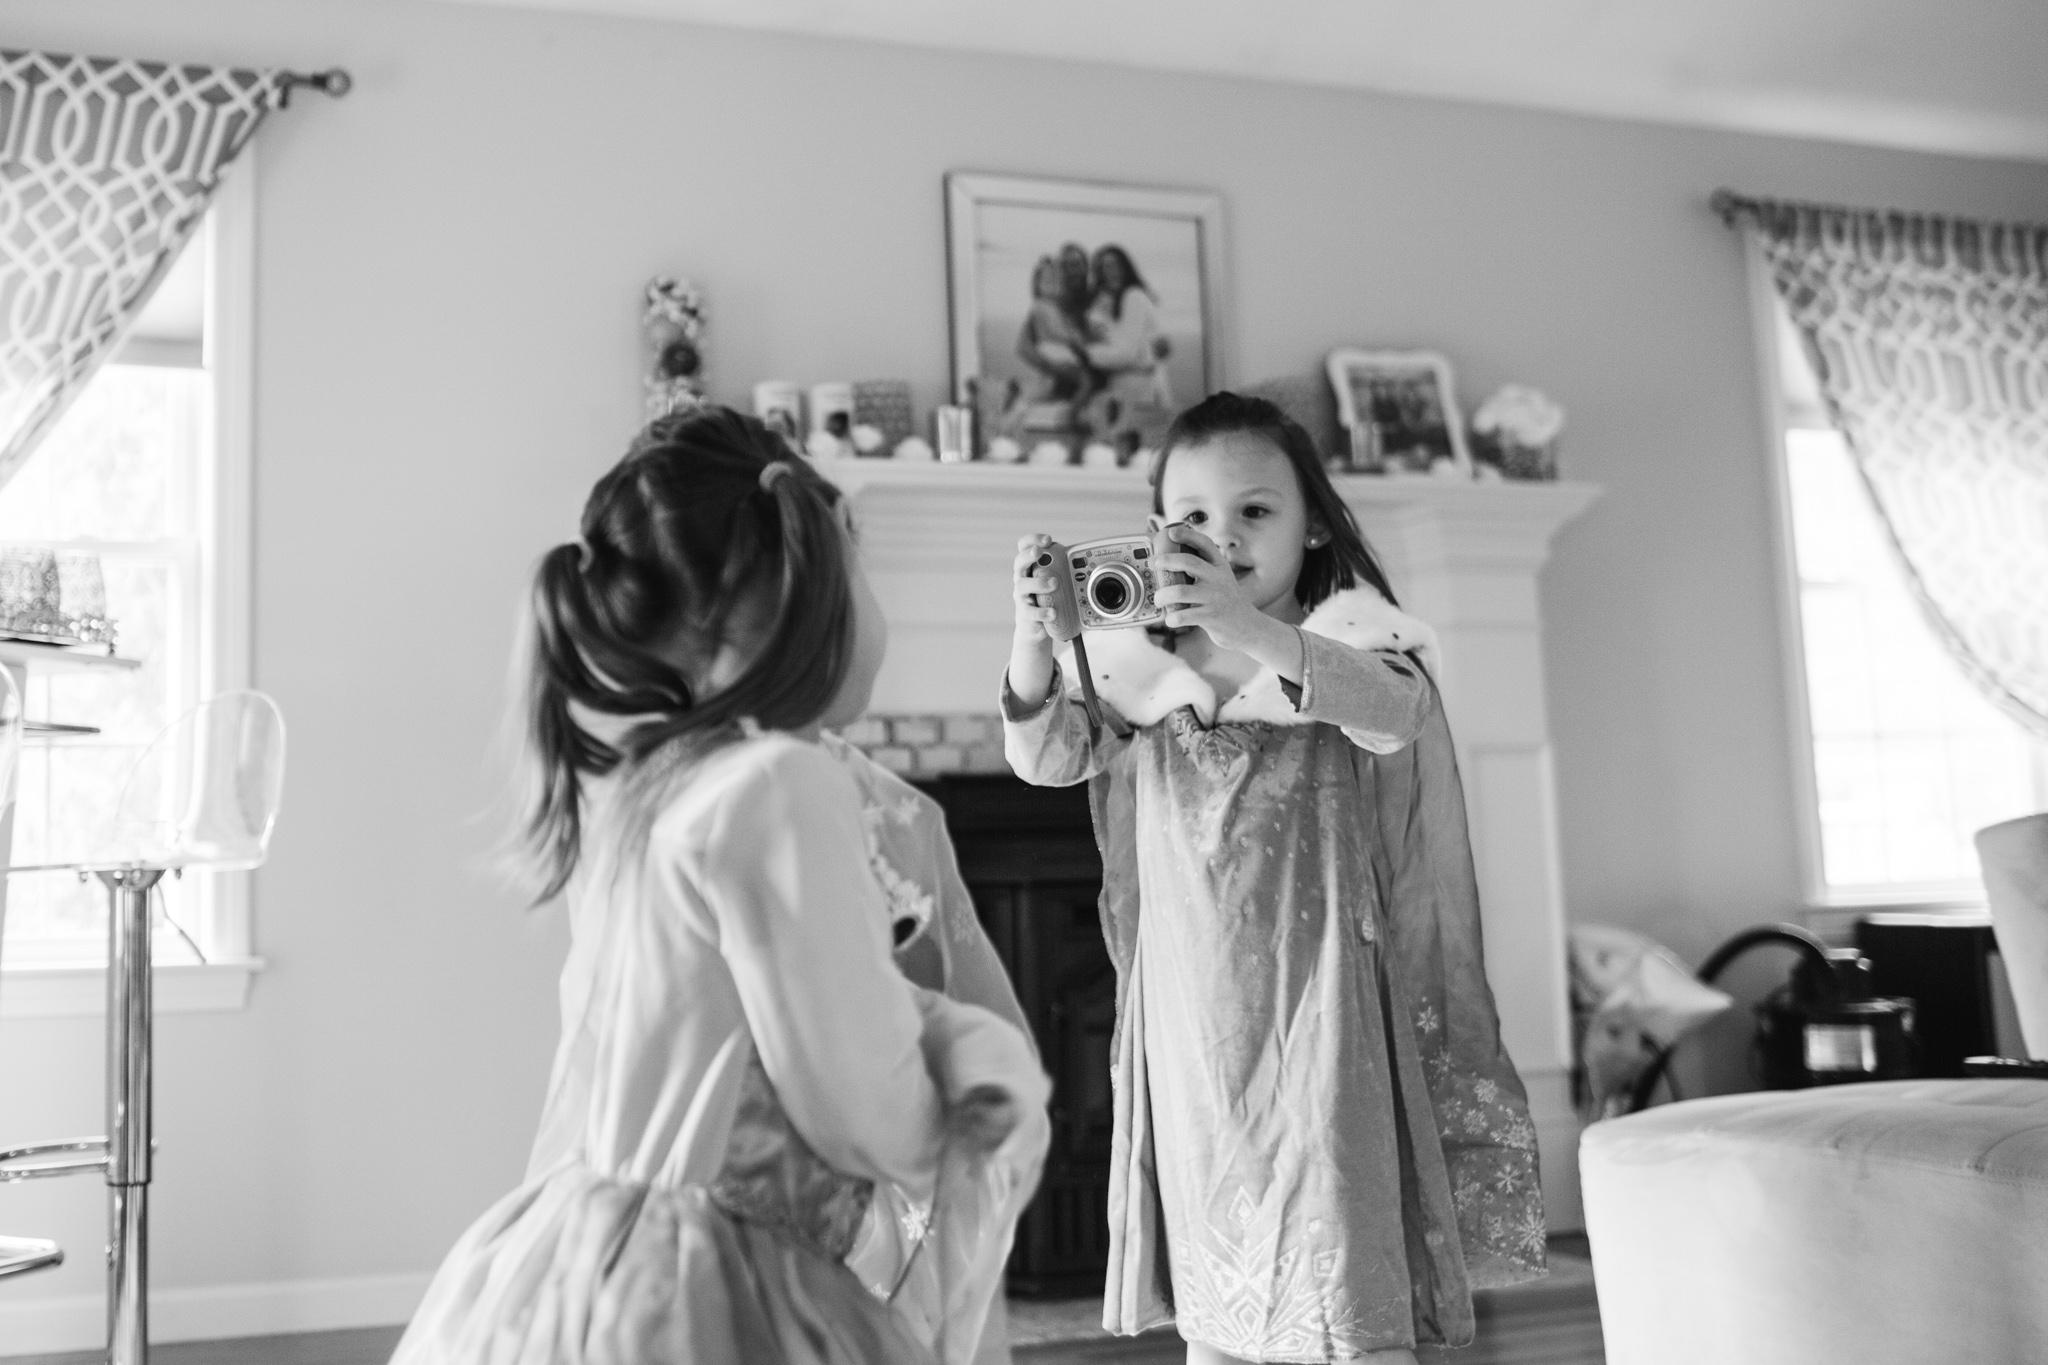 Ma_family_photographer_Kidsportraits-6.jpg